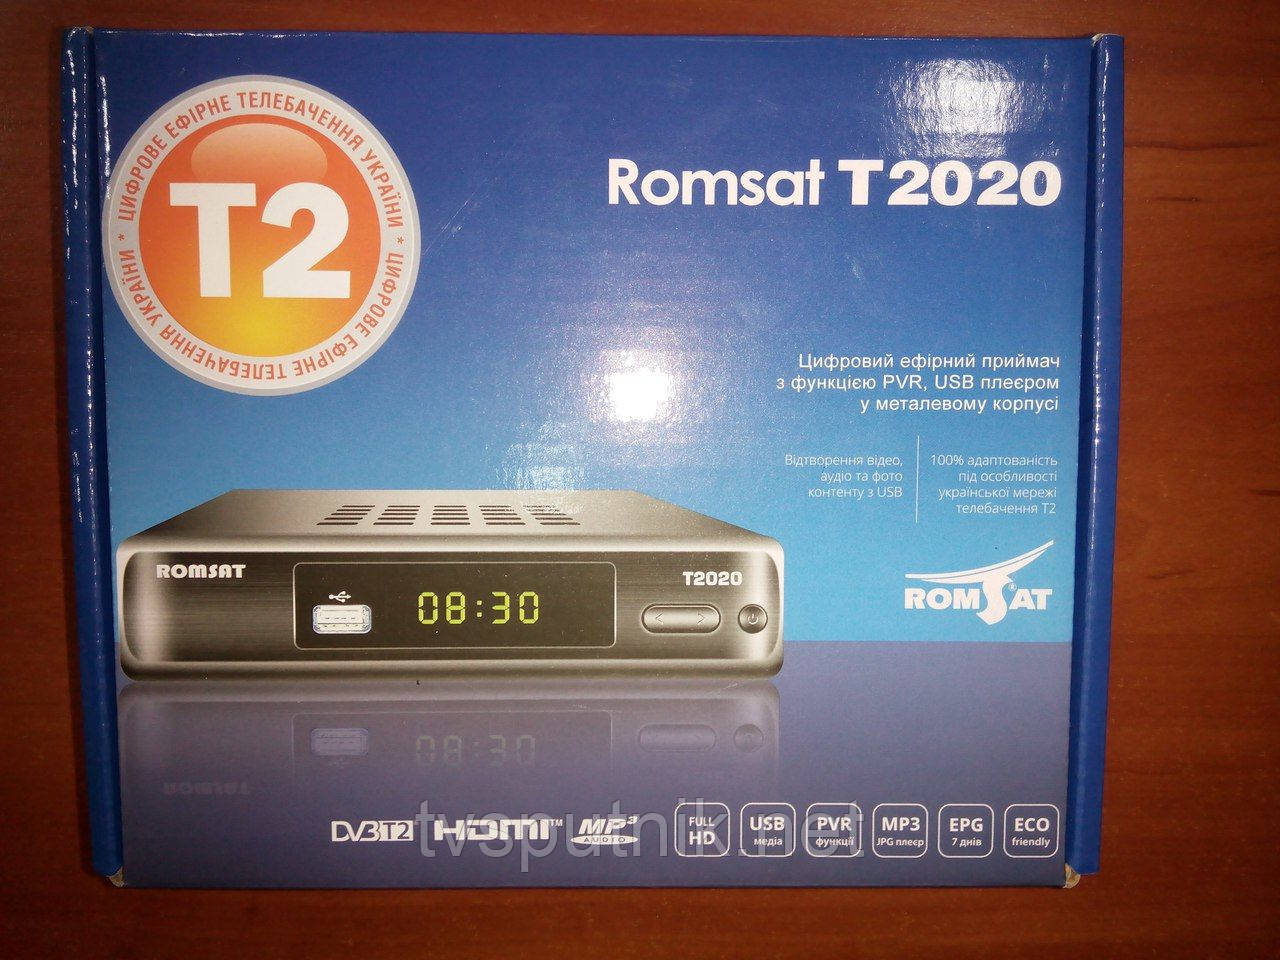 Эфирный тюнер Romsat T2020 (DVB-T2)